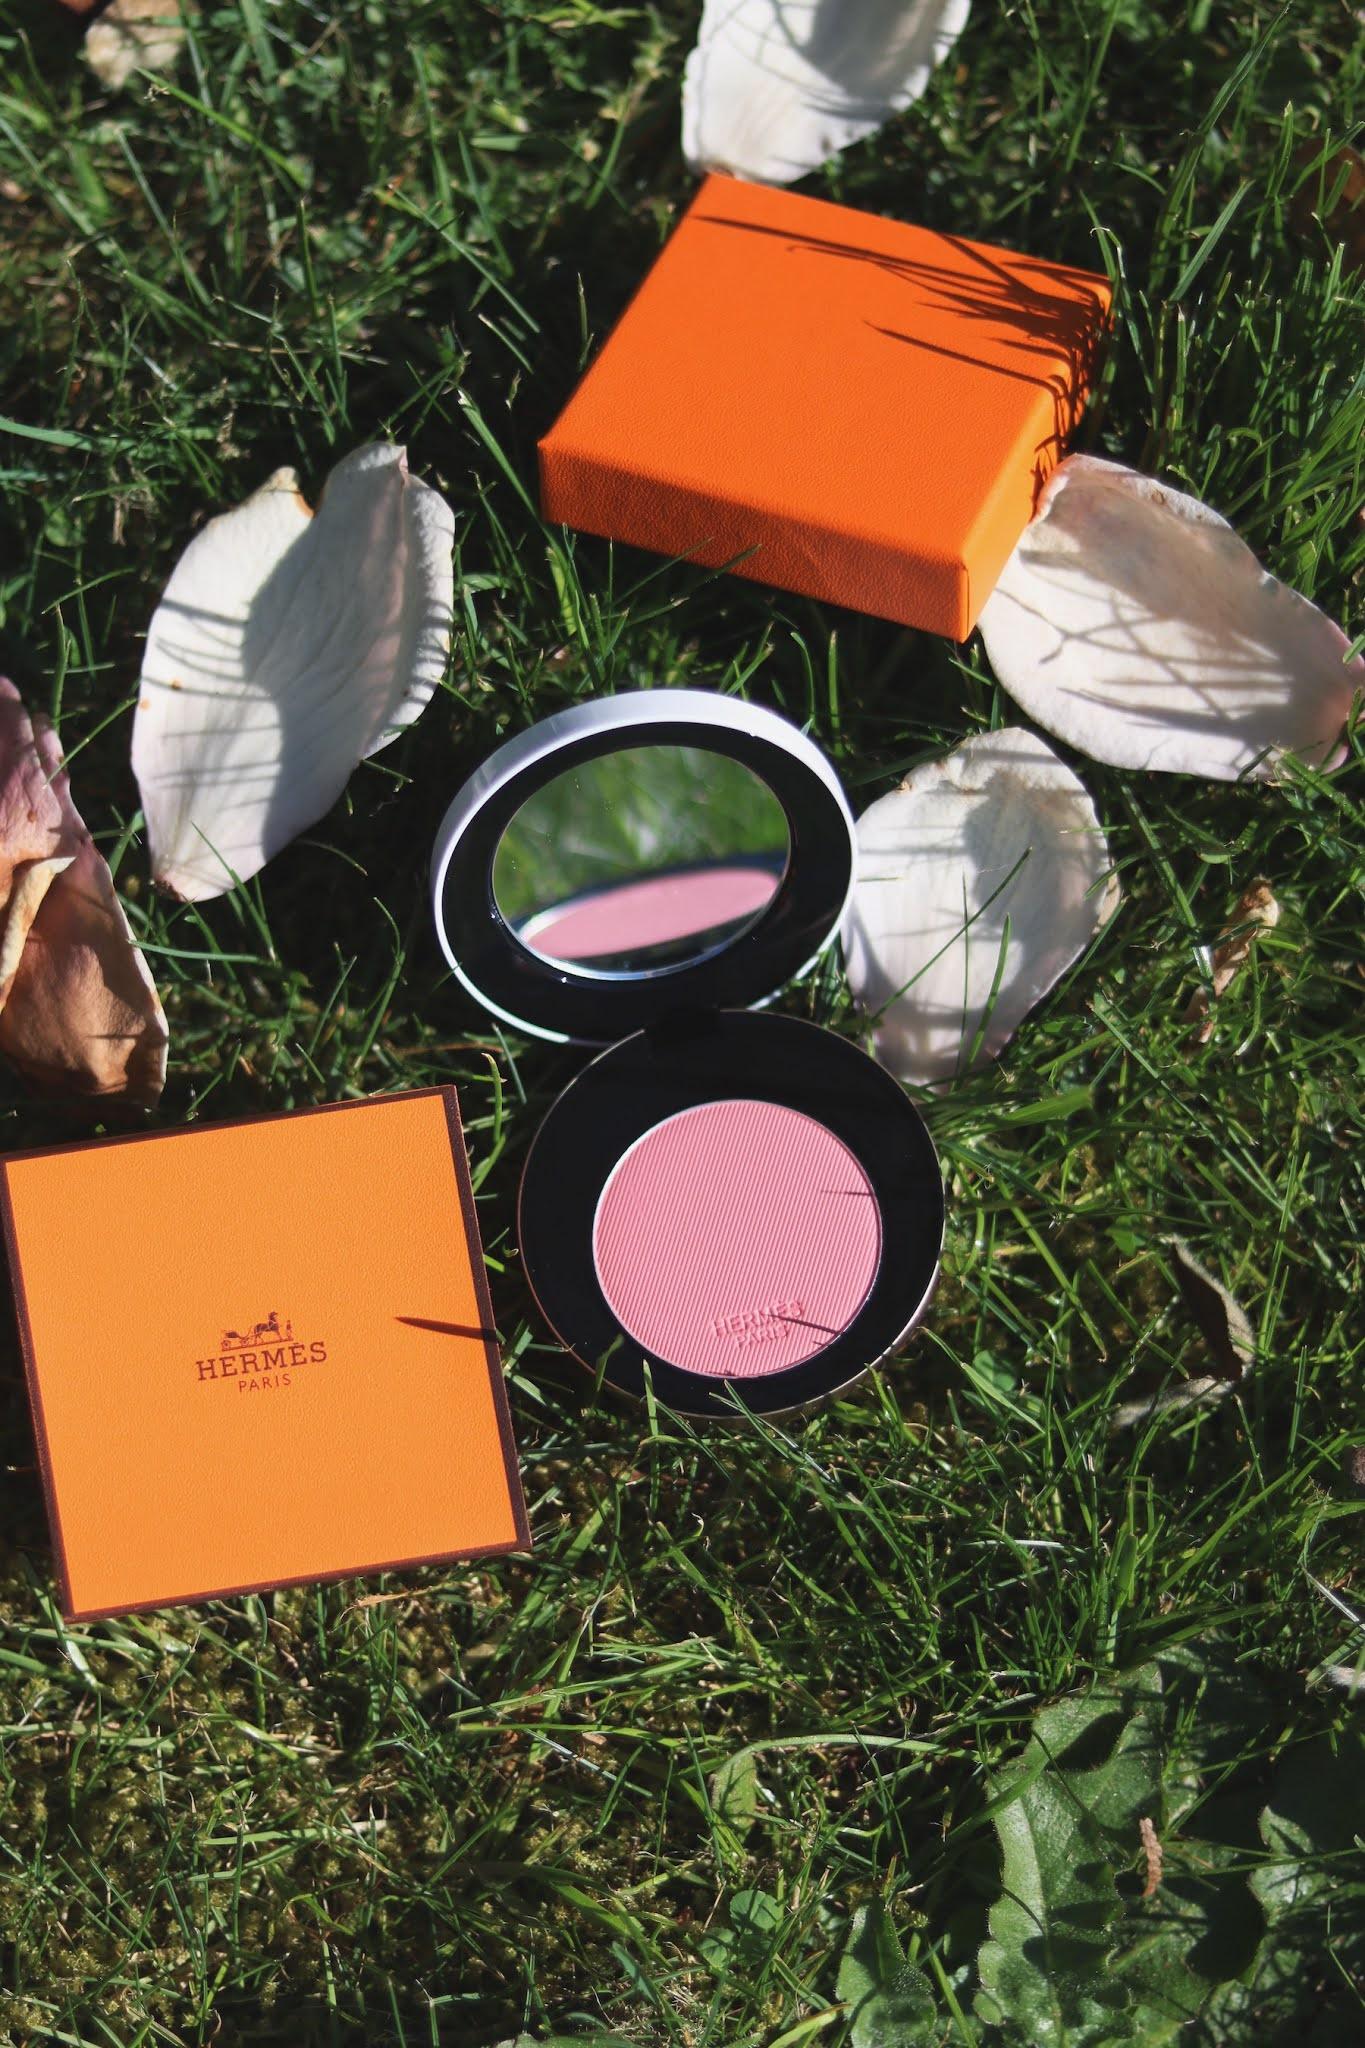 Rose Hermès Silk blush powder: A quick review